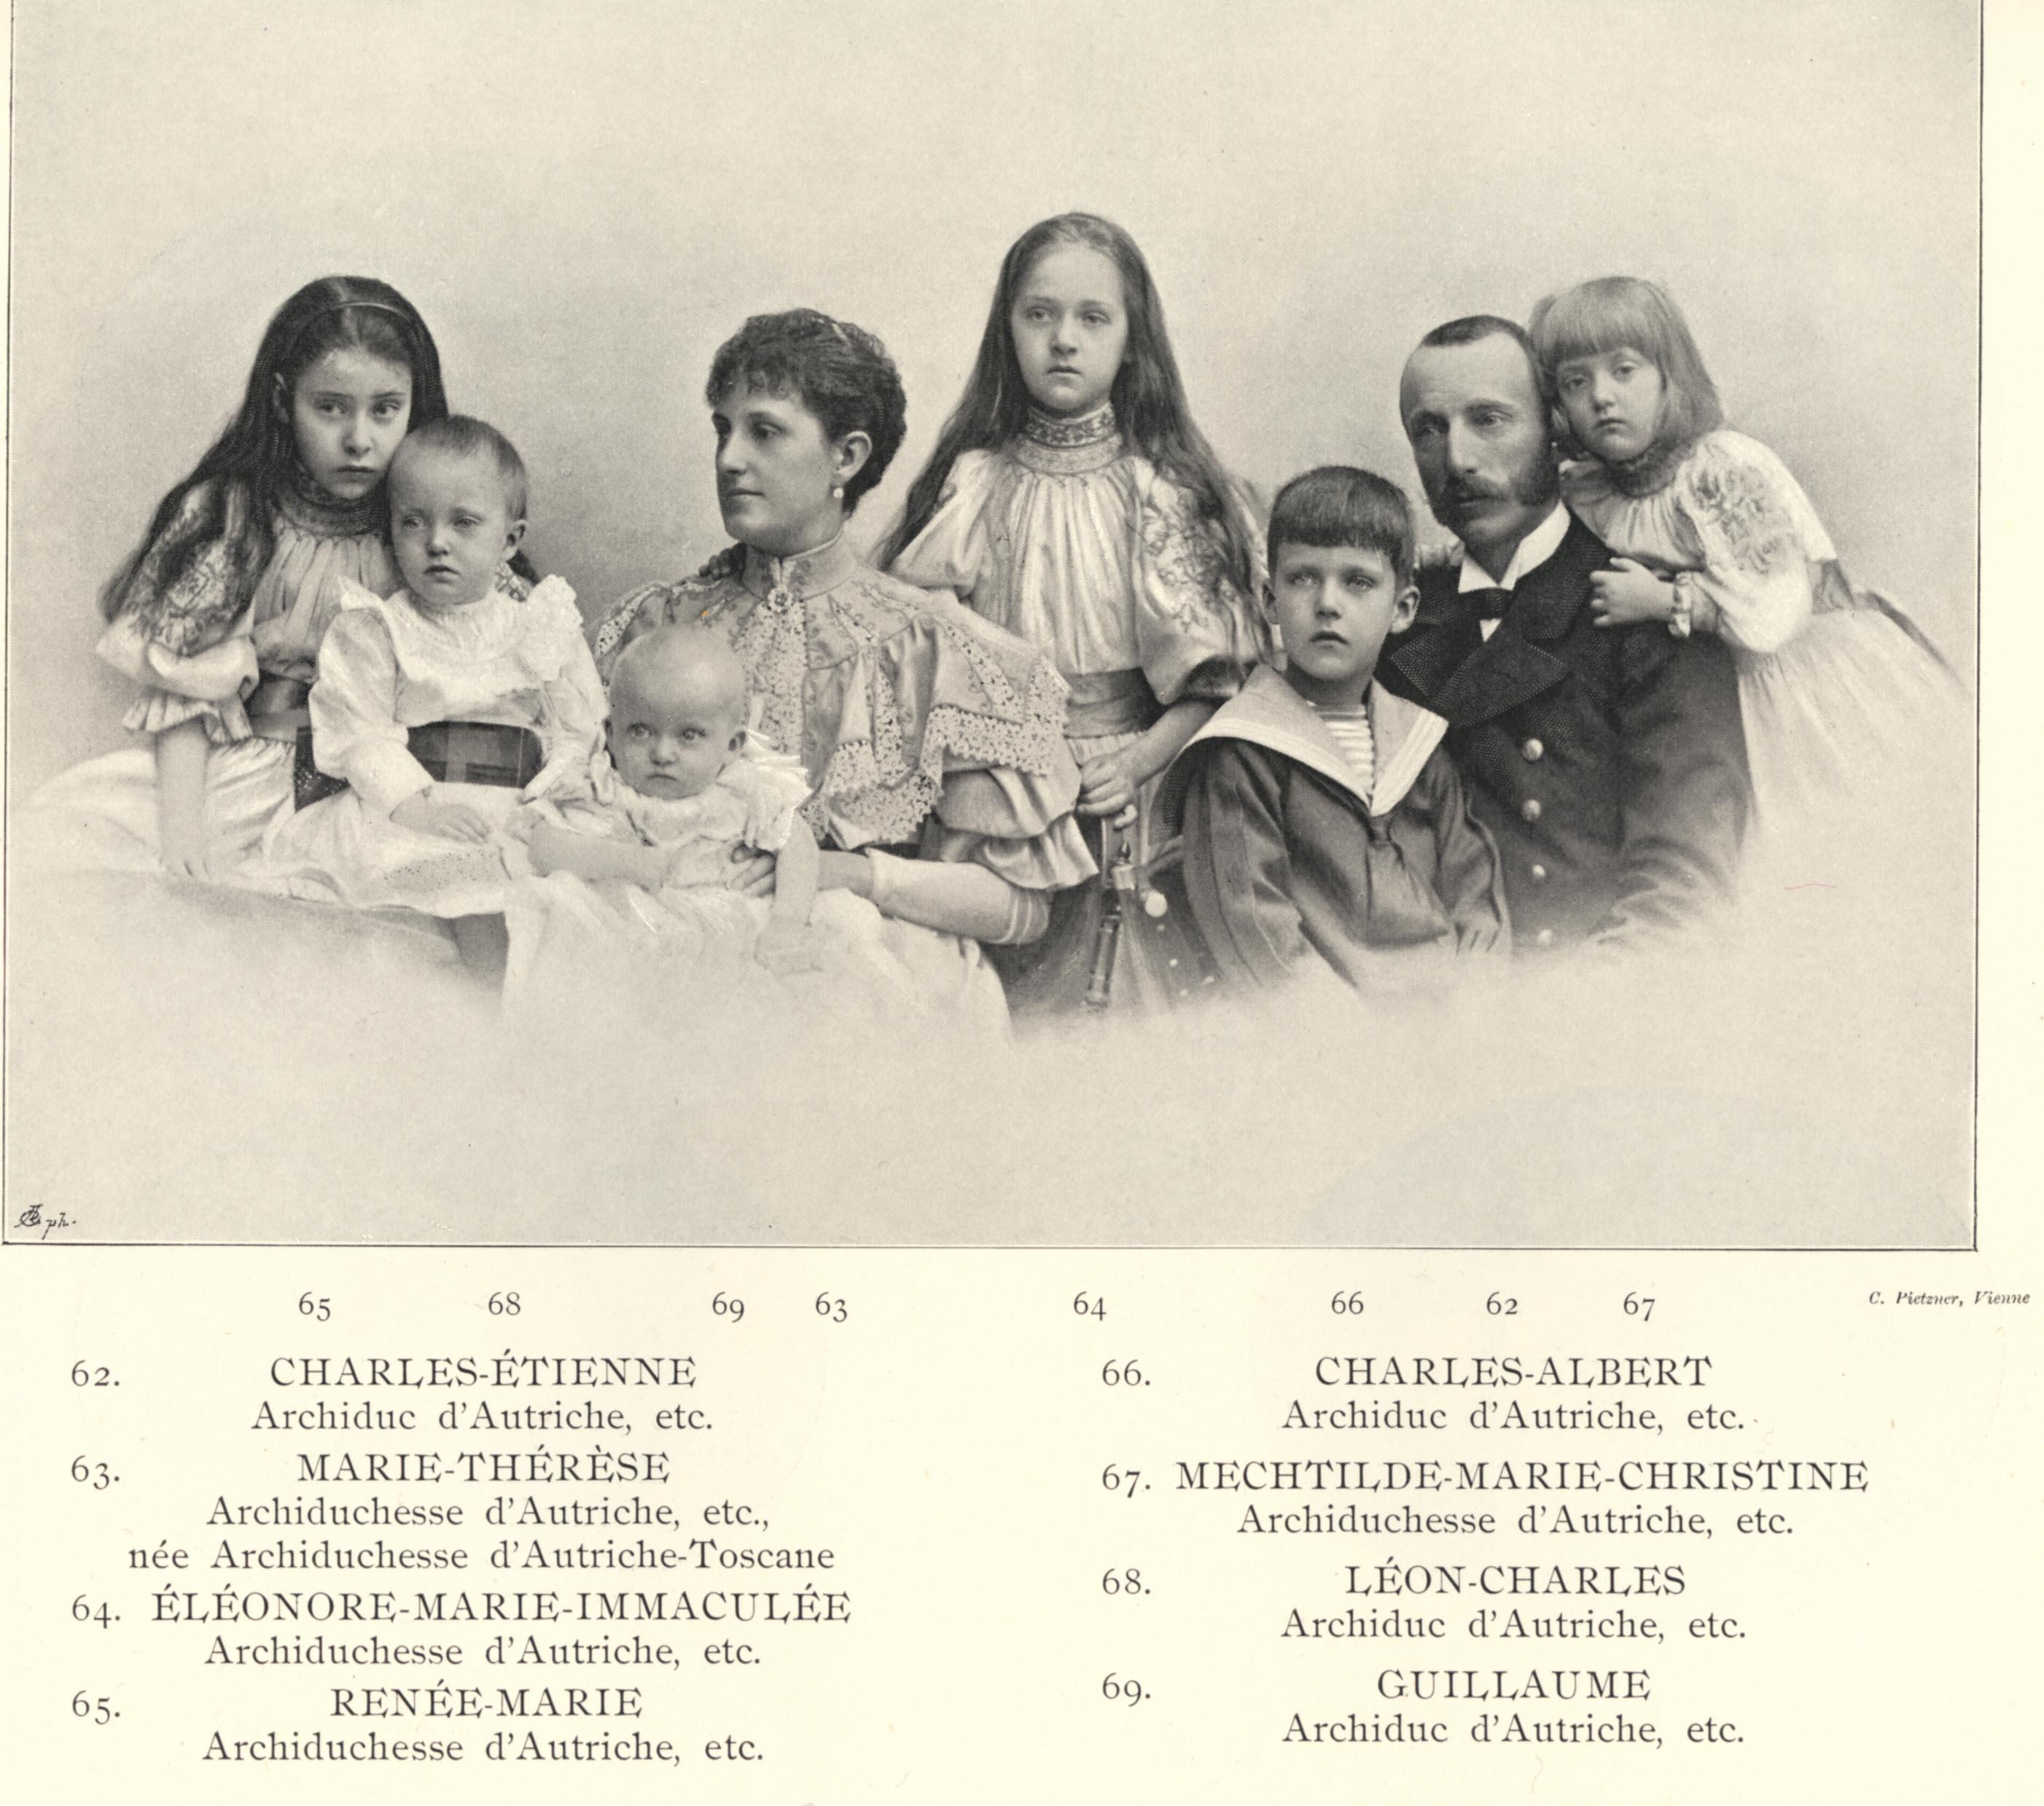 http://upload.wikimedia.org/wikipedia/commons/6/6b/Karl_Stephan_Austria_1860_1933_family1896.jpg